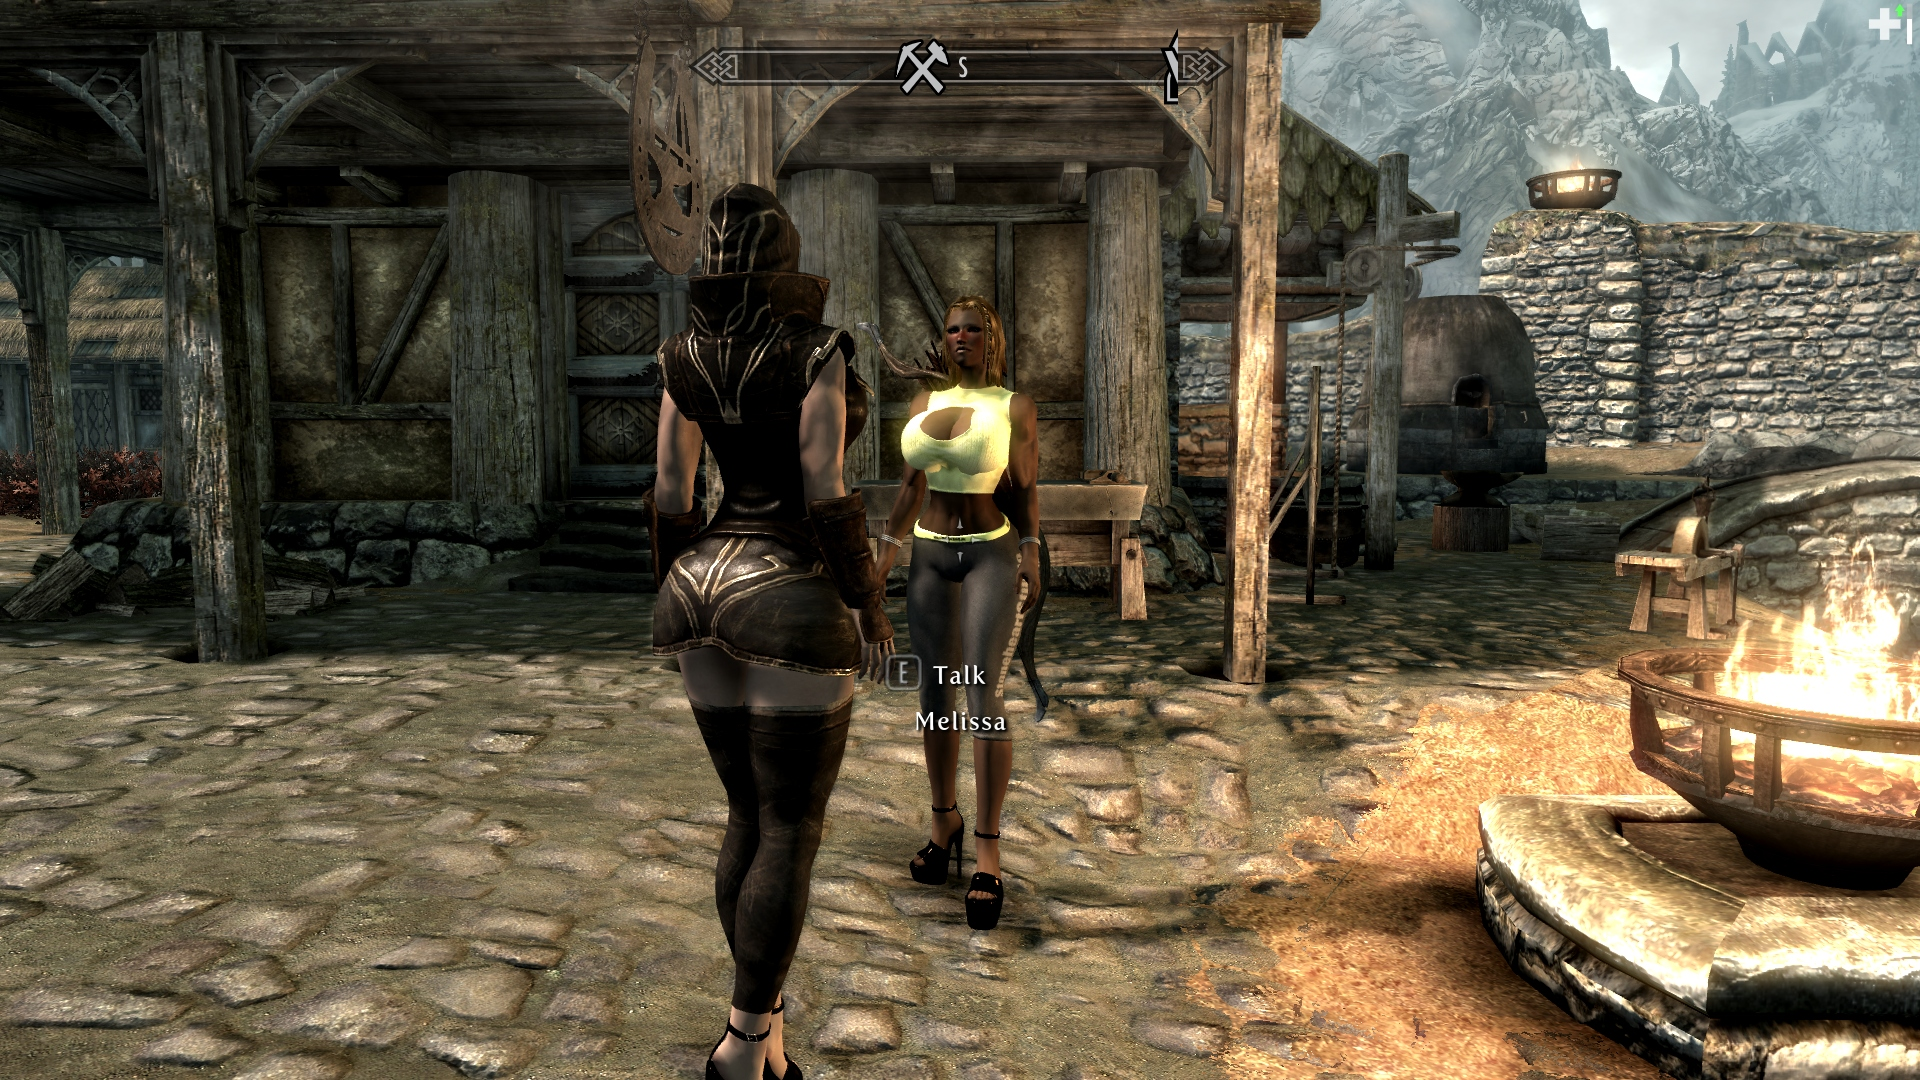 Sexlab defeat skyrim Help Installing